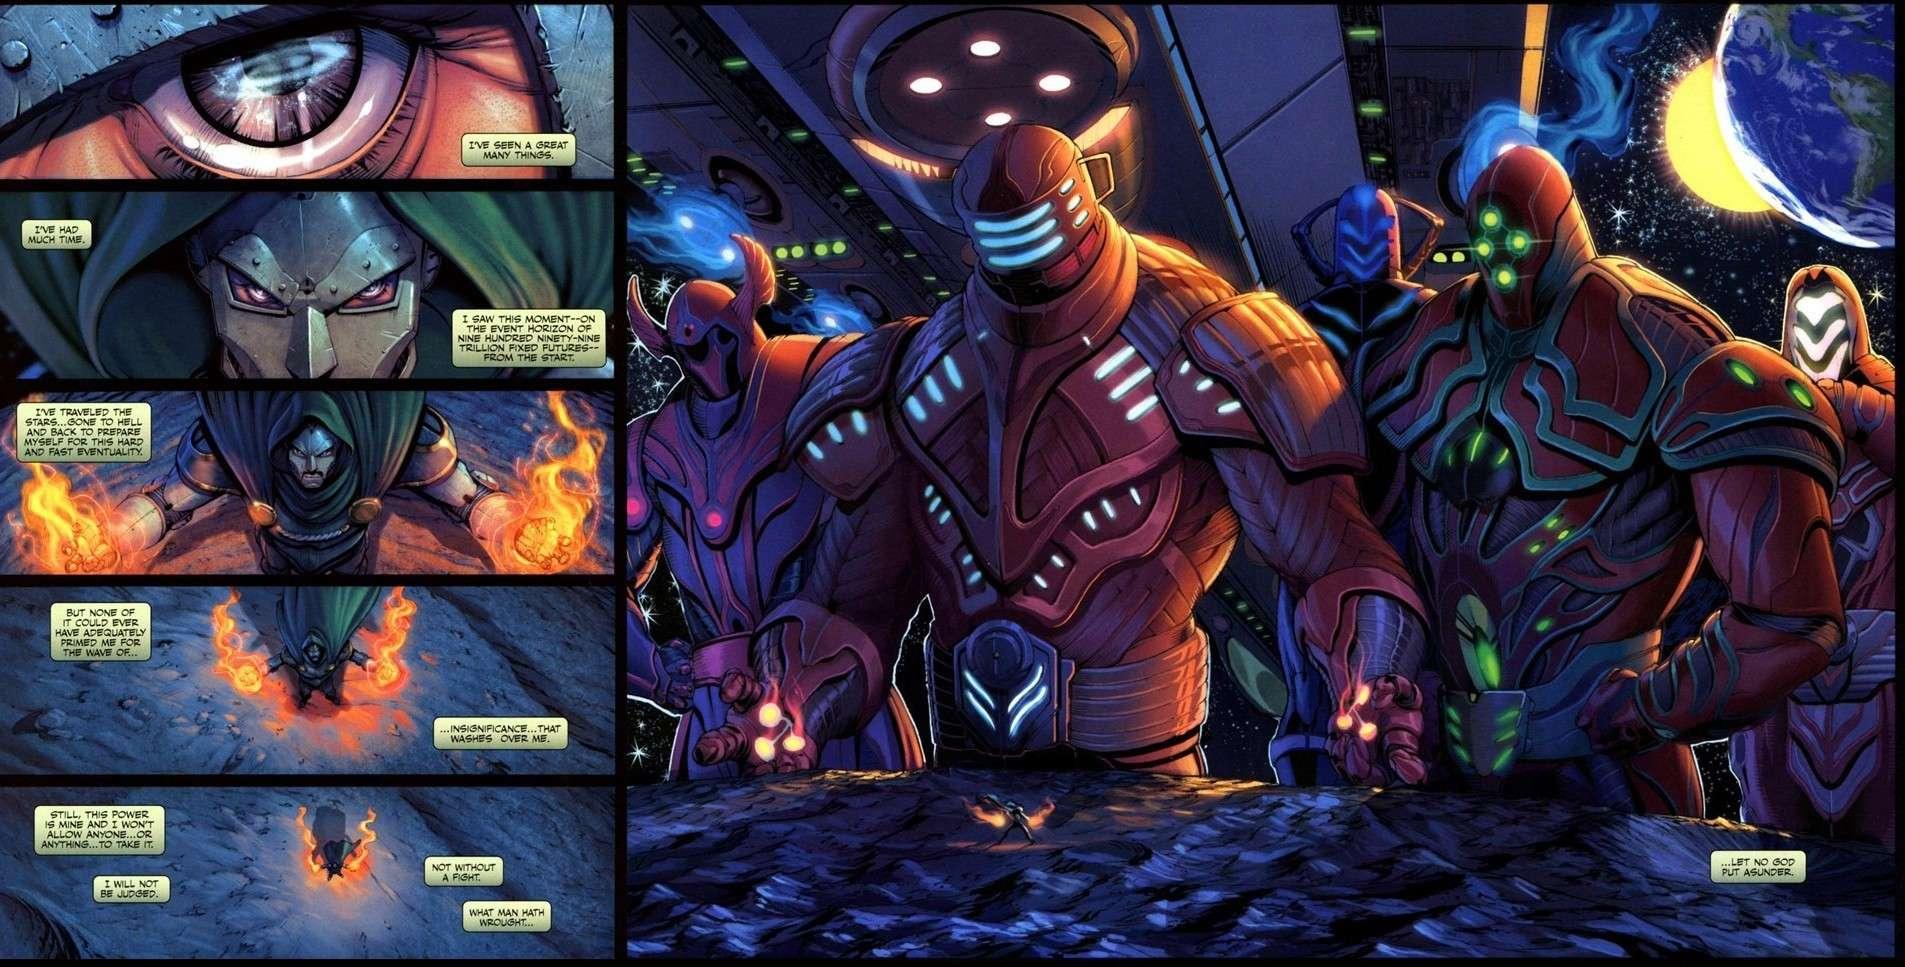 Dr.Doom (What If: Secret Wars With Beyonder Power) Vs The Beyonders